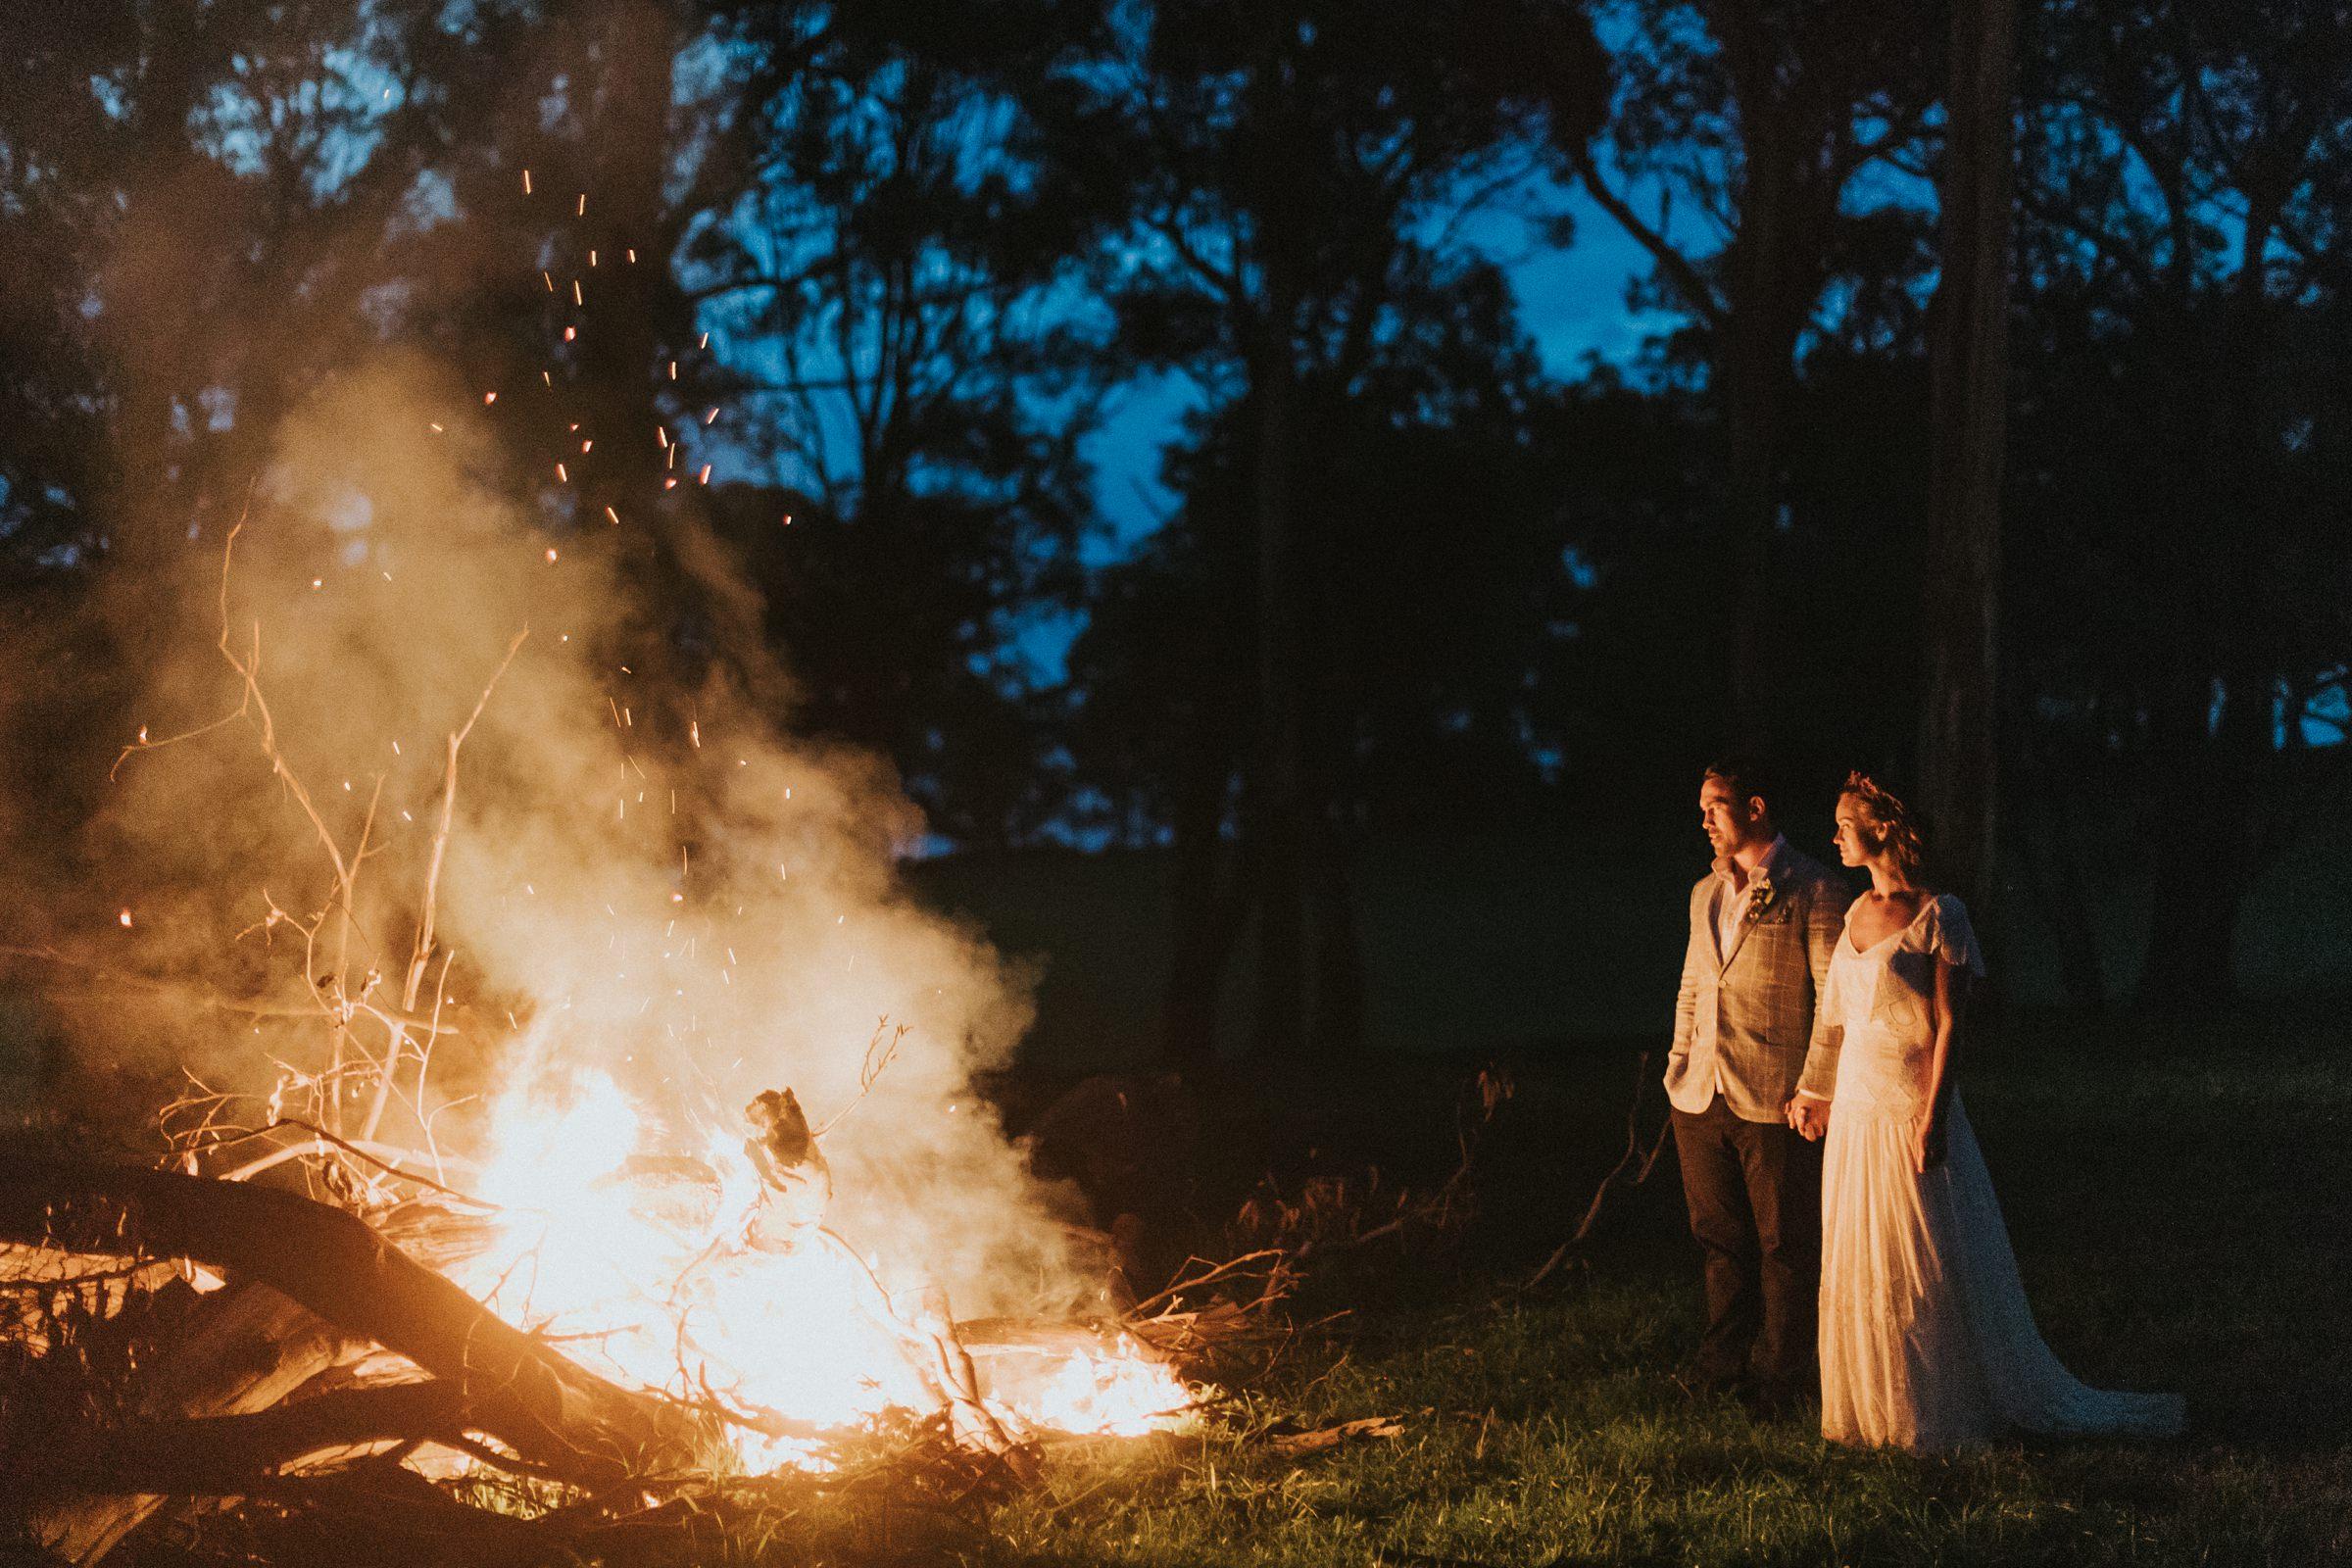 mali brae bonfire portraits